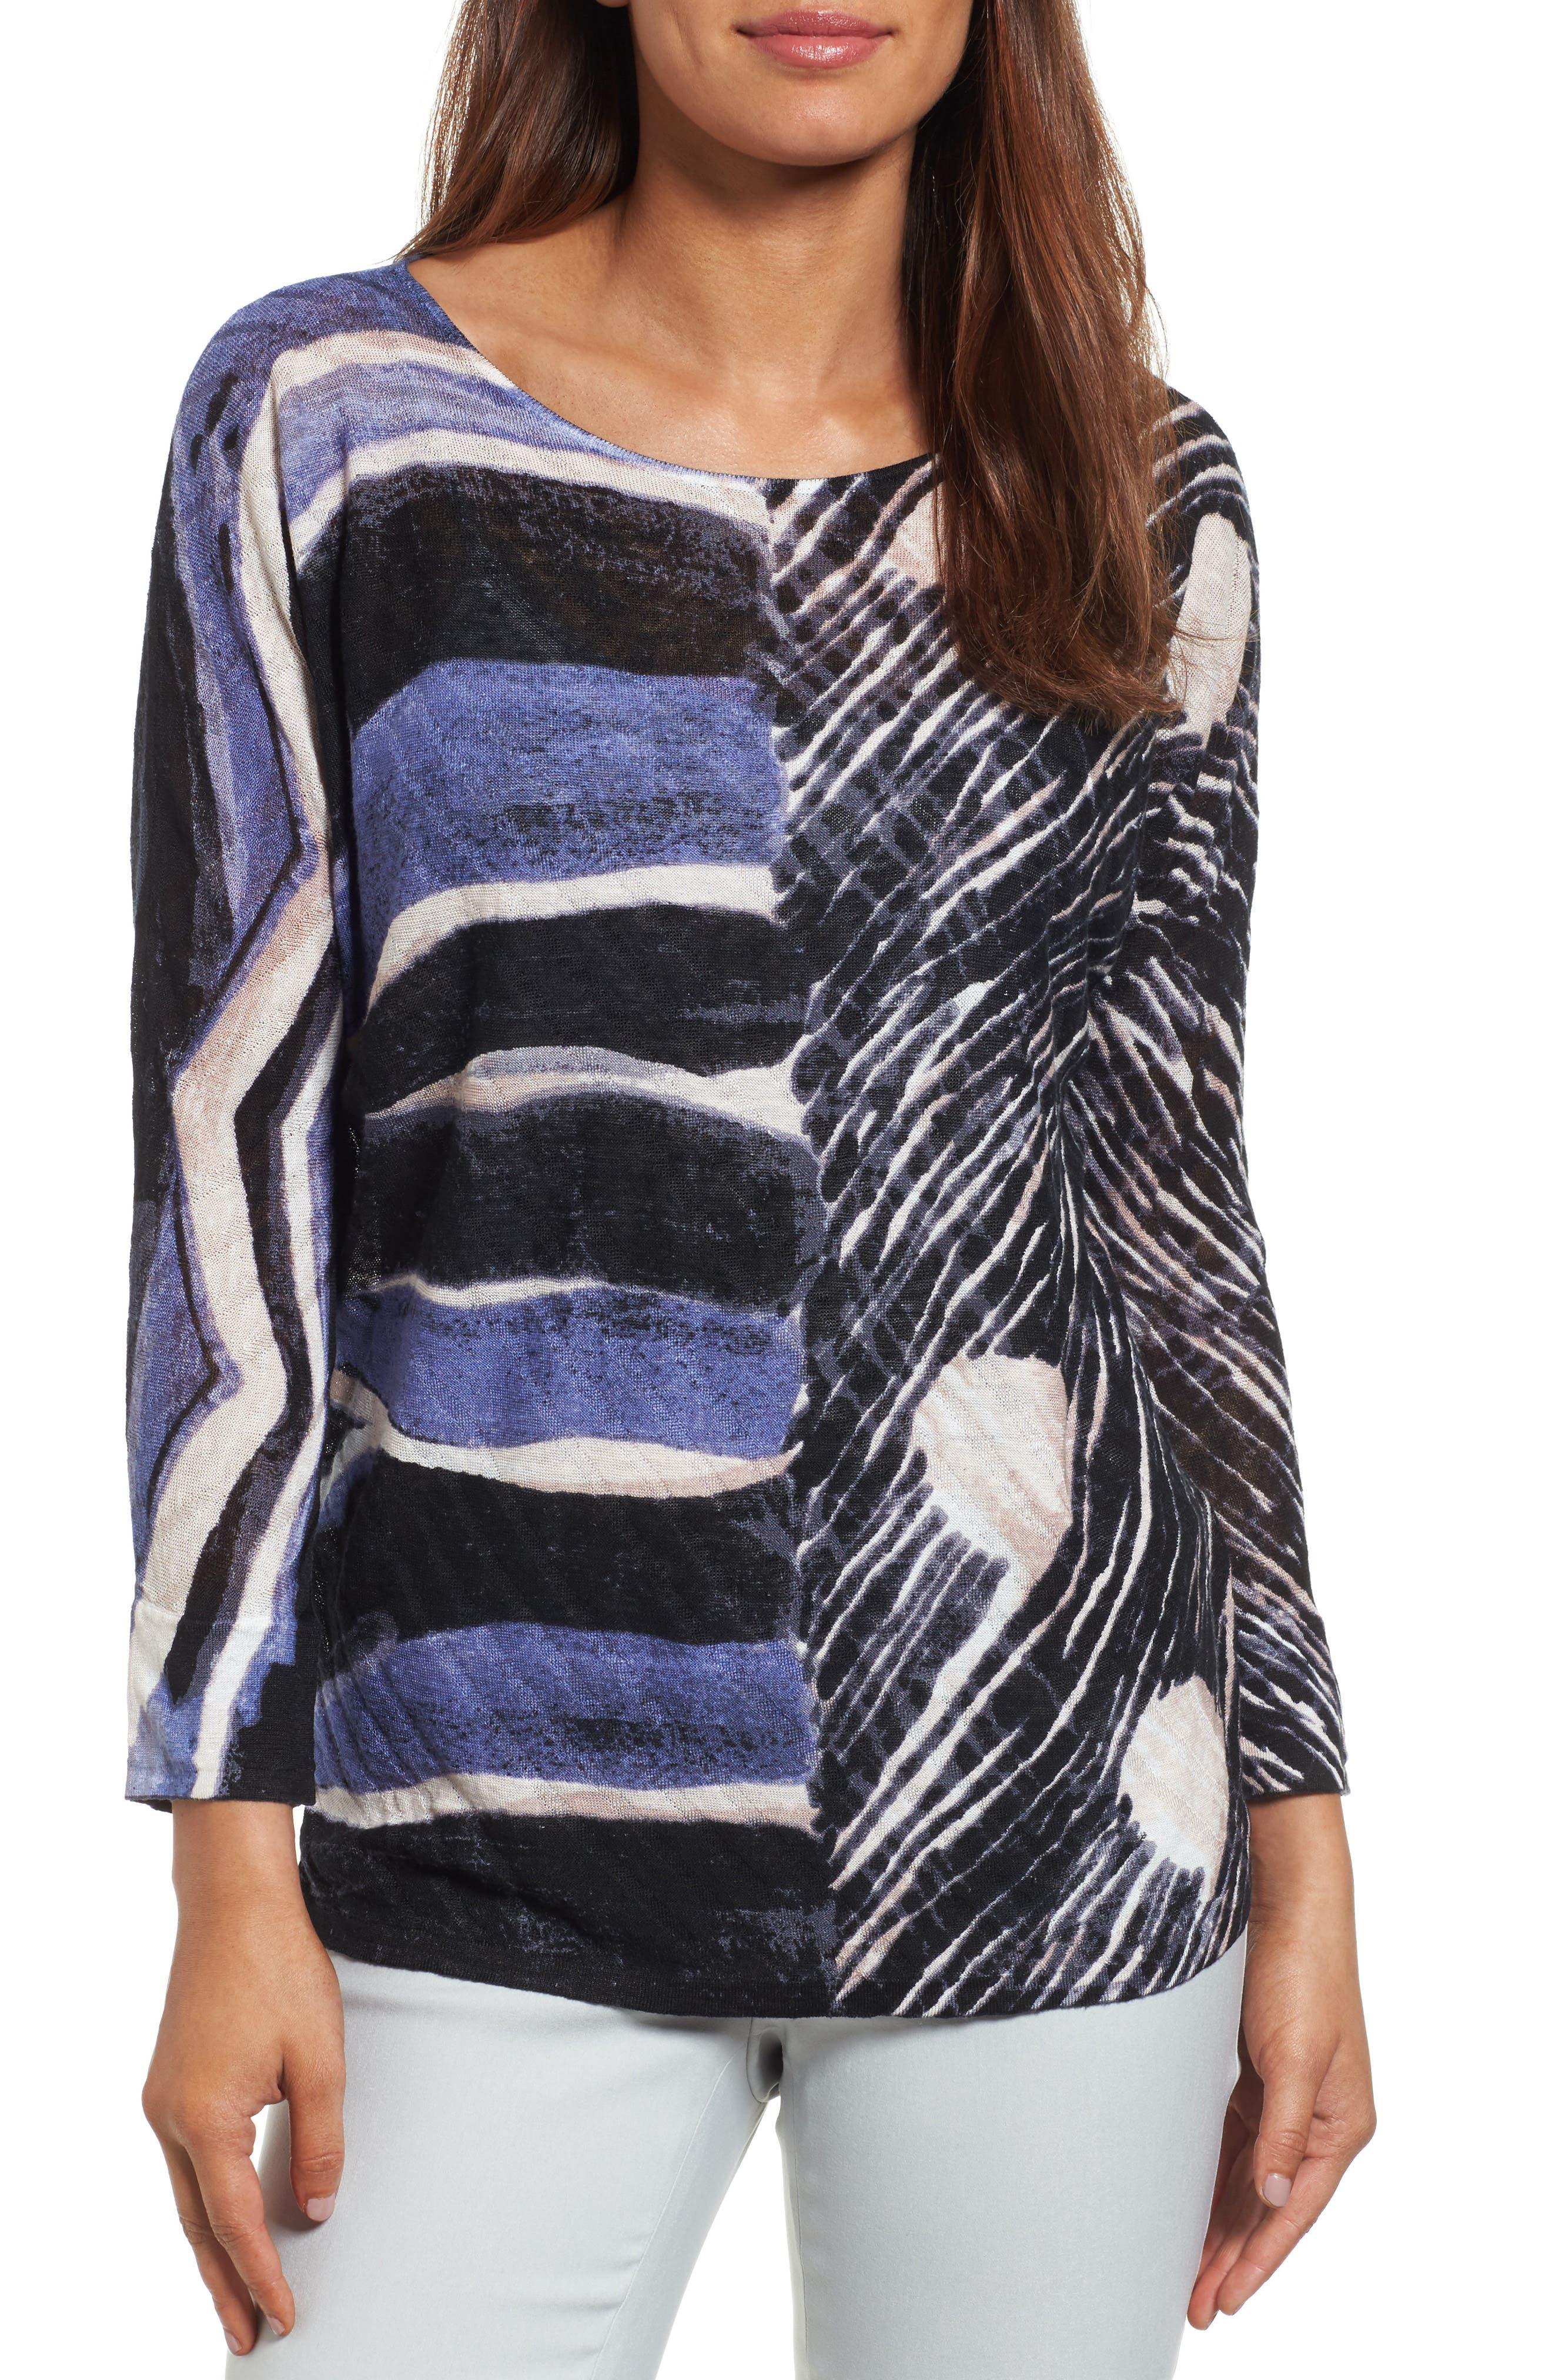 Sierra Sweater,                         Main,                         color, Multi